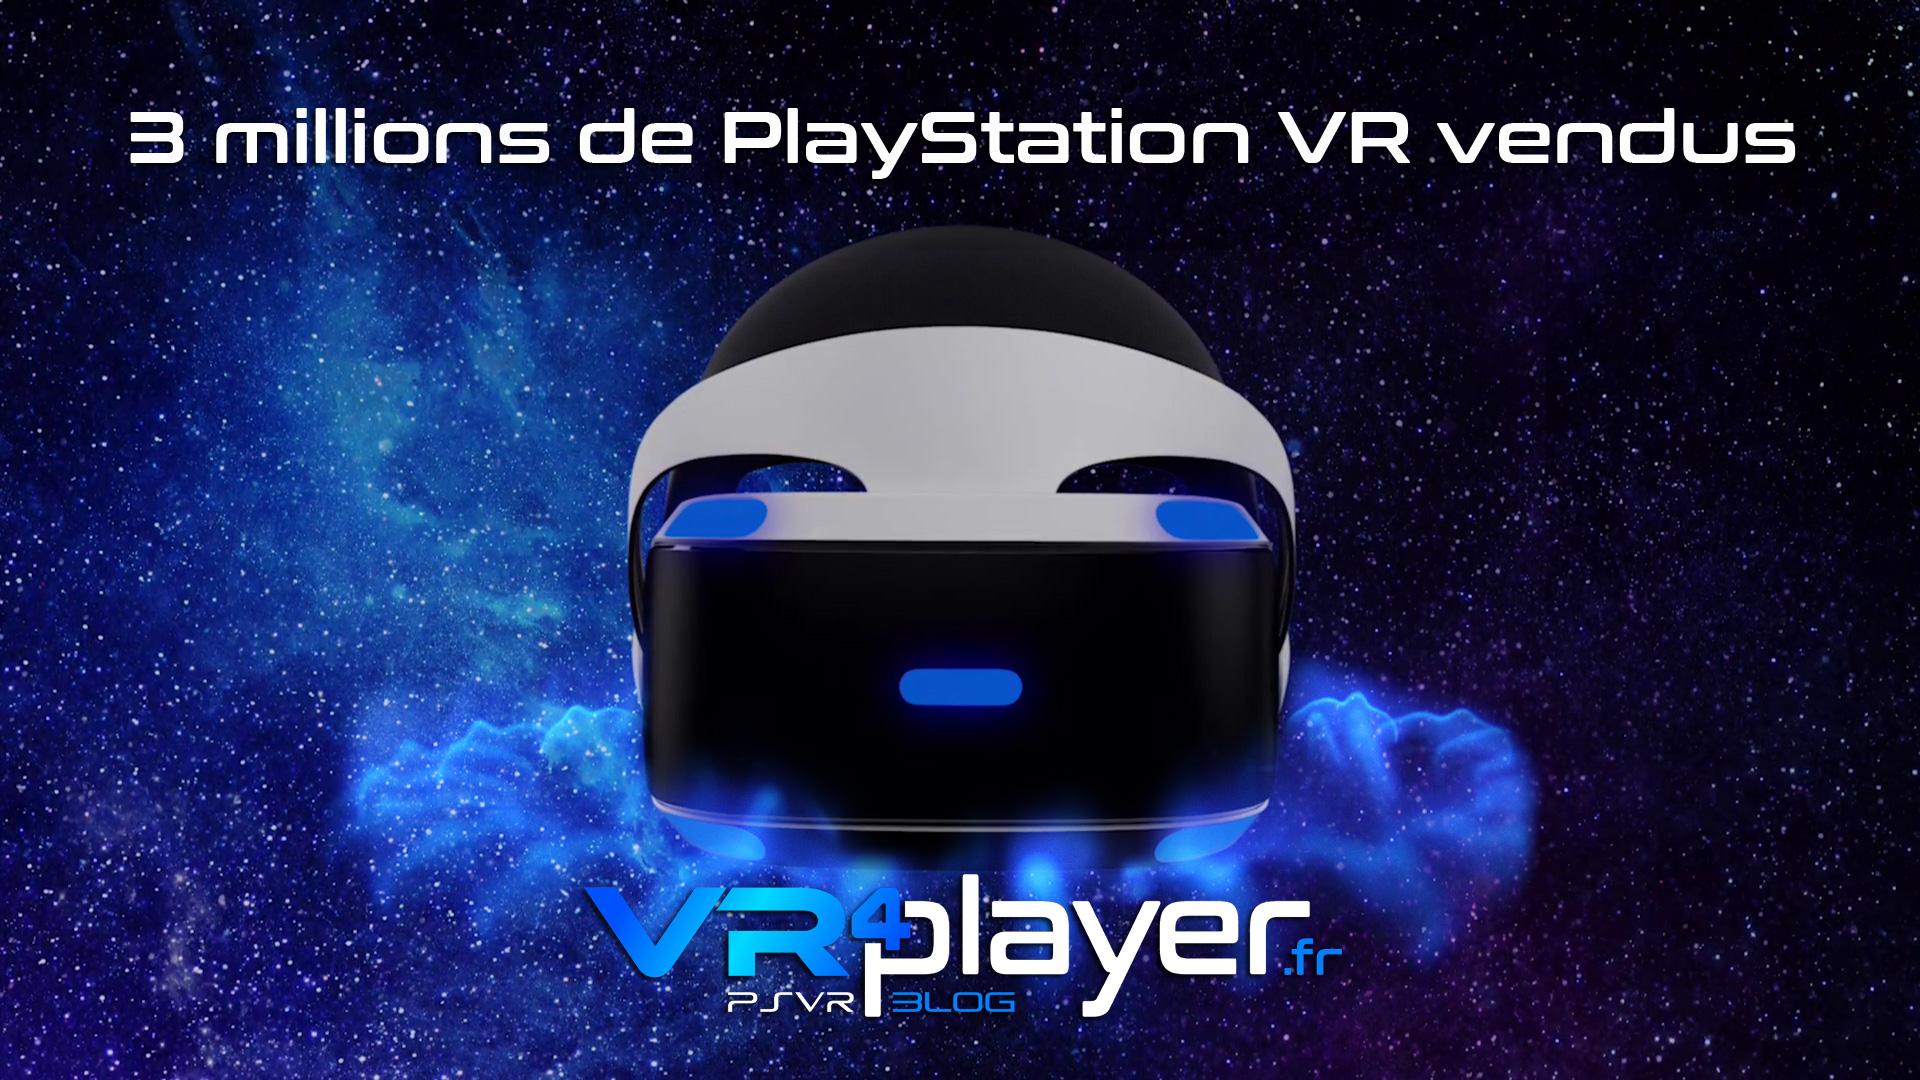 3 millions de PlayStation VR vendus -vr4player.fr